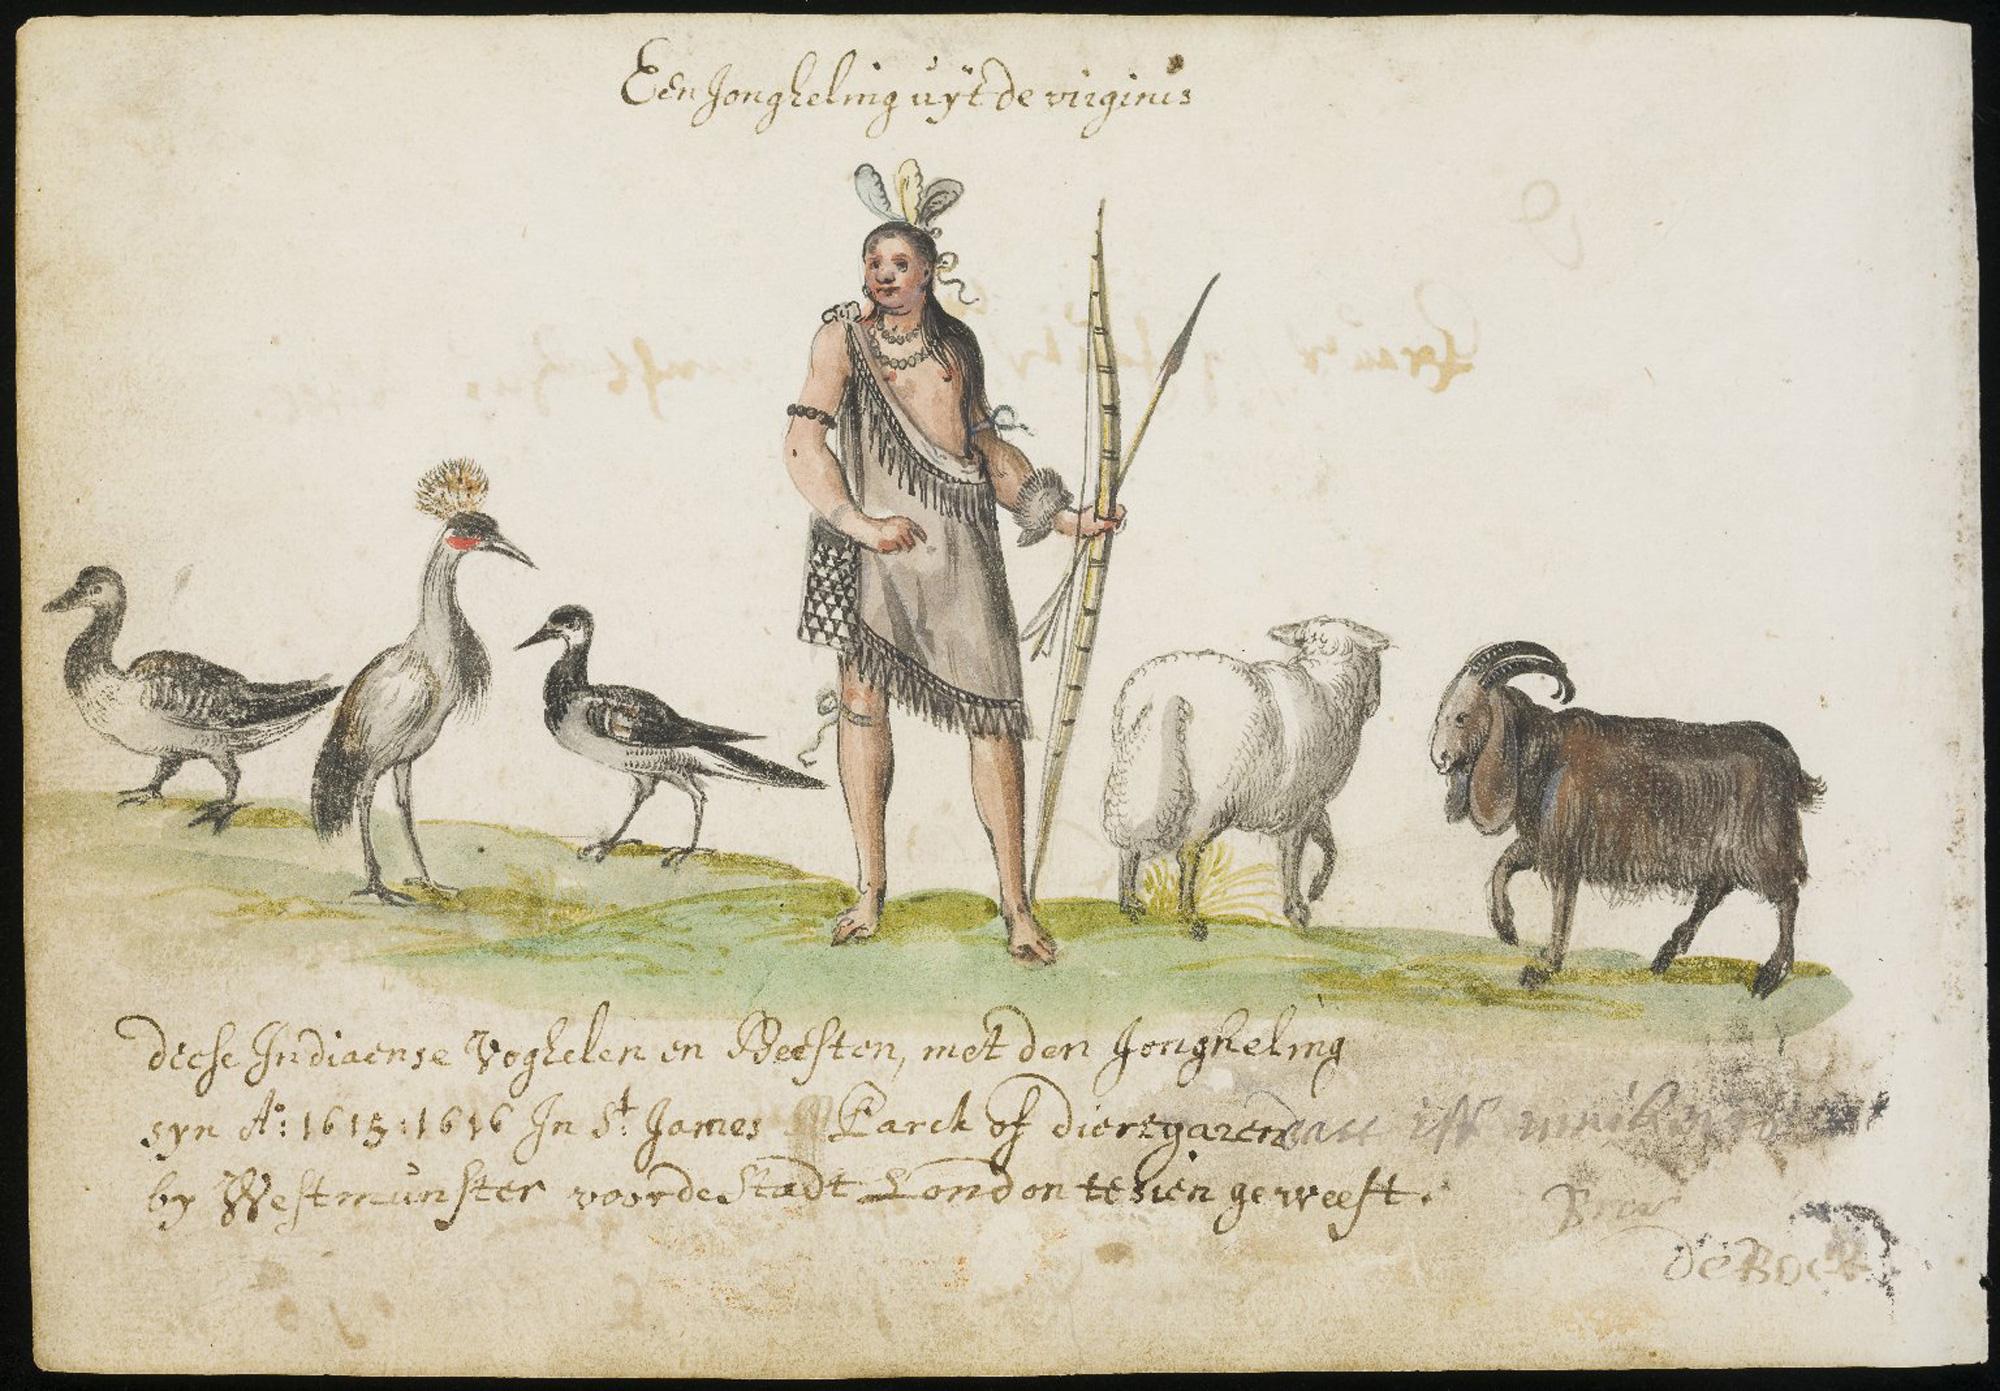 A Virginian Indian in St James's Park, from the Friendship Album of Michael van Meer